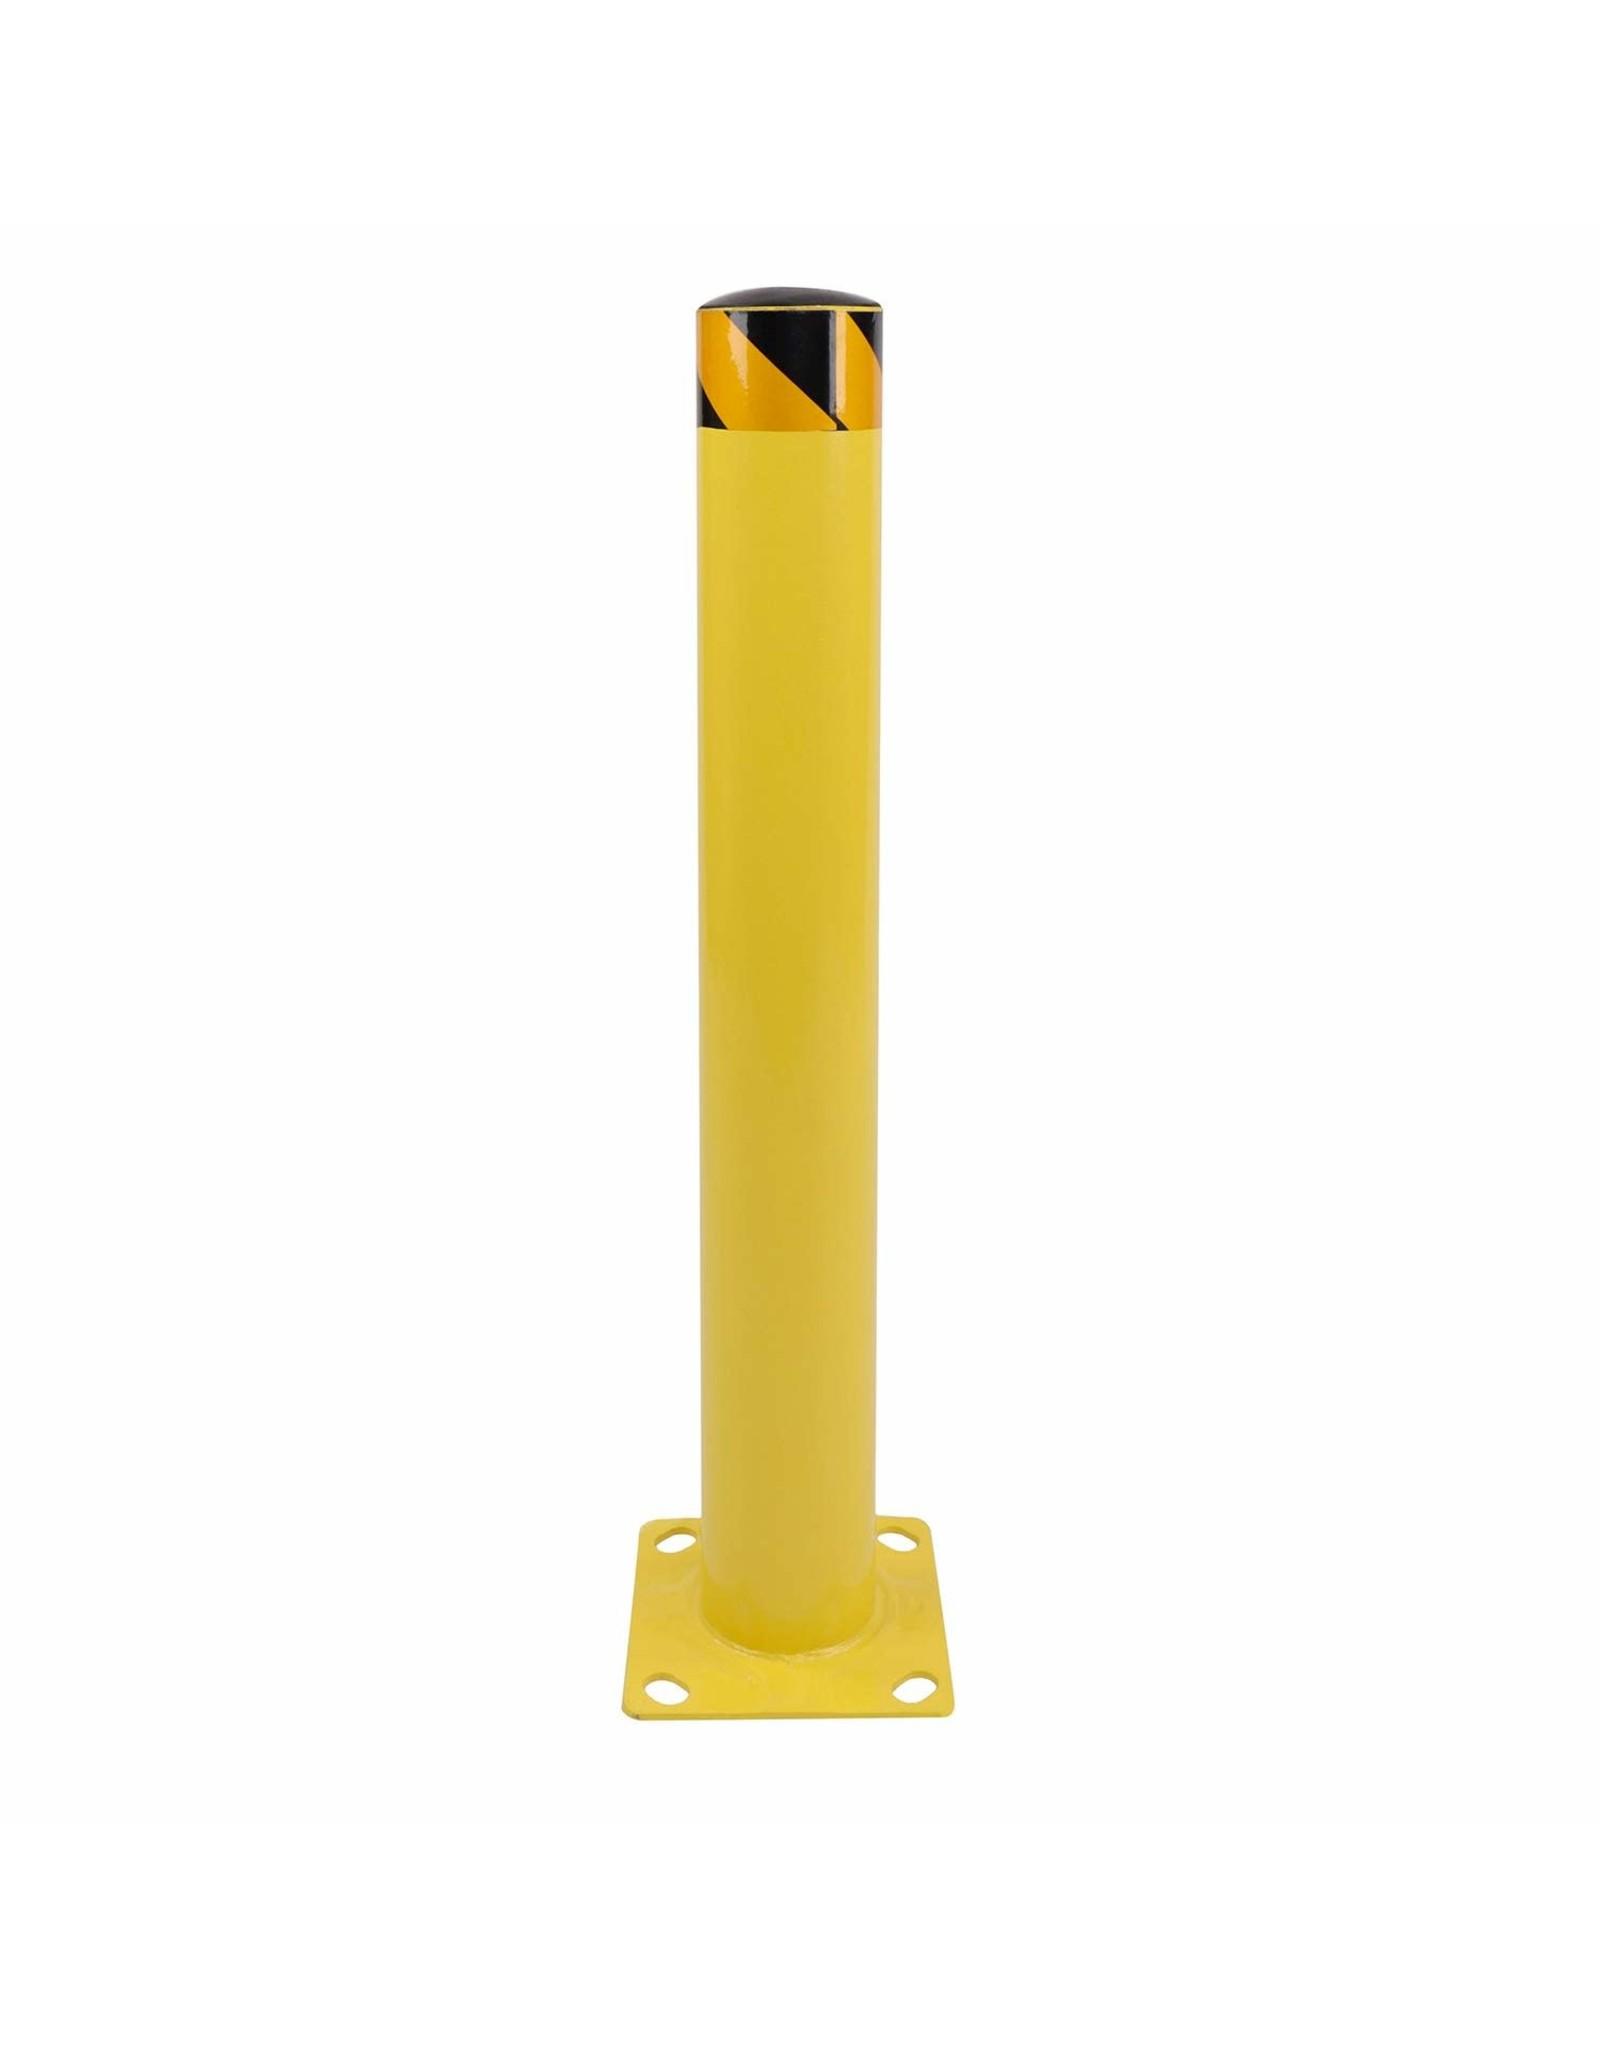 BISupply BISupply Safety Bollard Post 36 x 4.5 Inches - Yellow Pipe Bollards Steel Parking Barrier for Garage or Parking Lot, 1pk